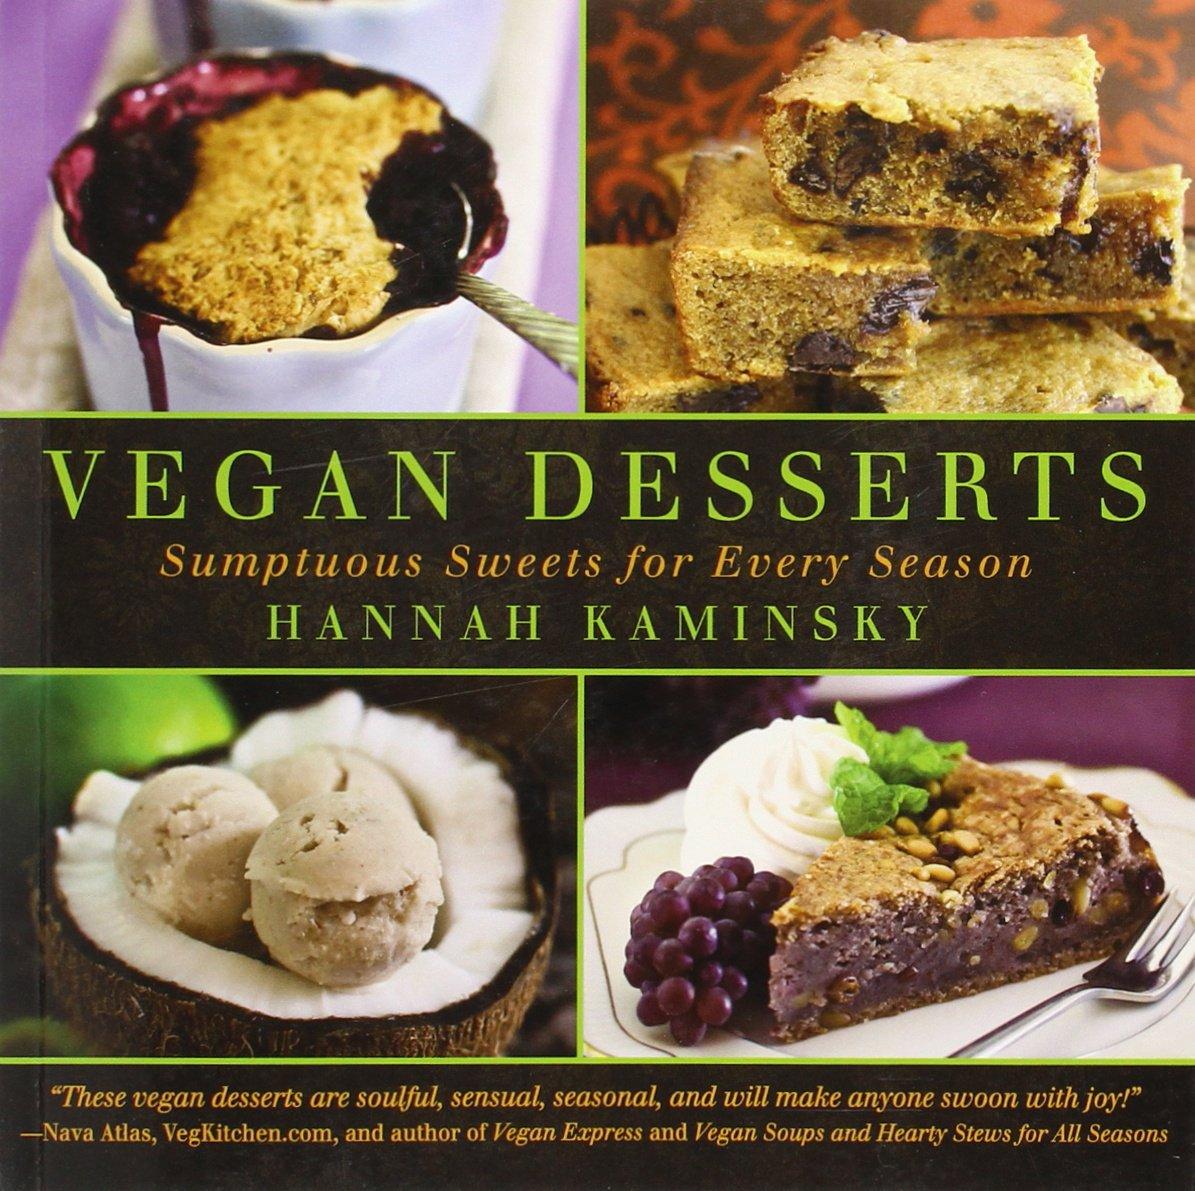 Vegan Desserts Sumptuous Sweets Season